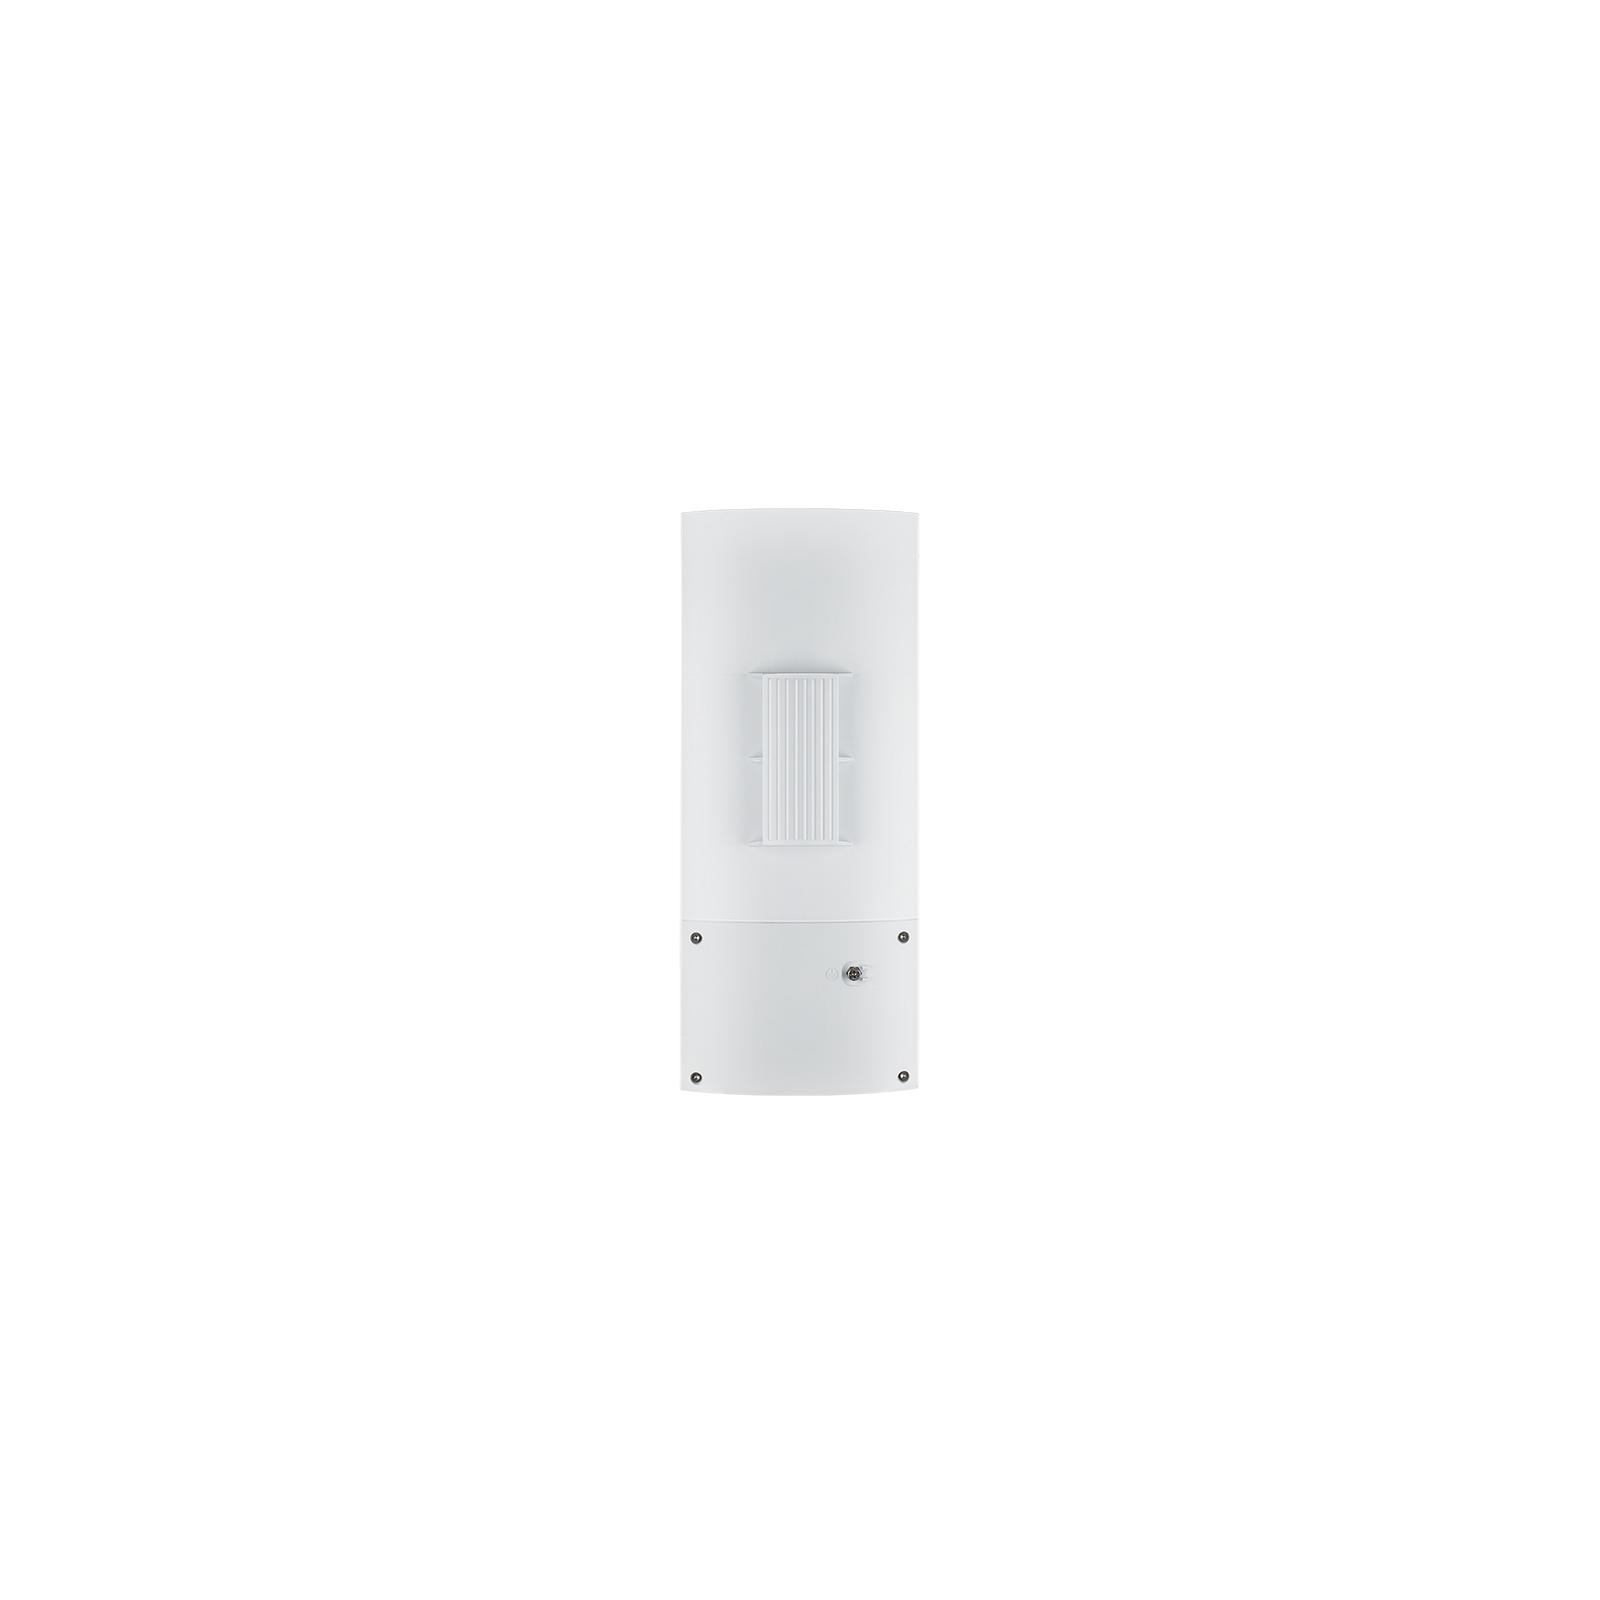 Точка доступа Wi-Fi D-Link DWL-6700AP/A2A изображение 2